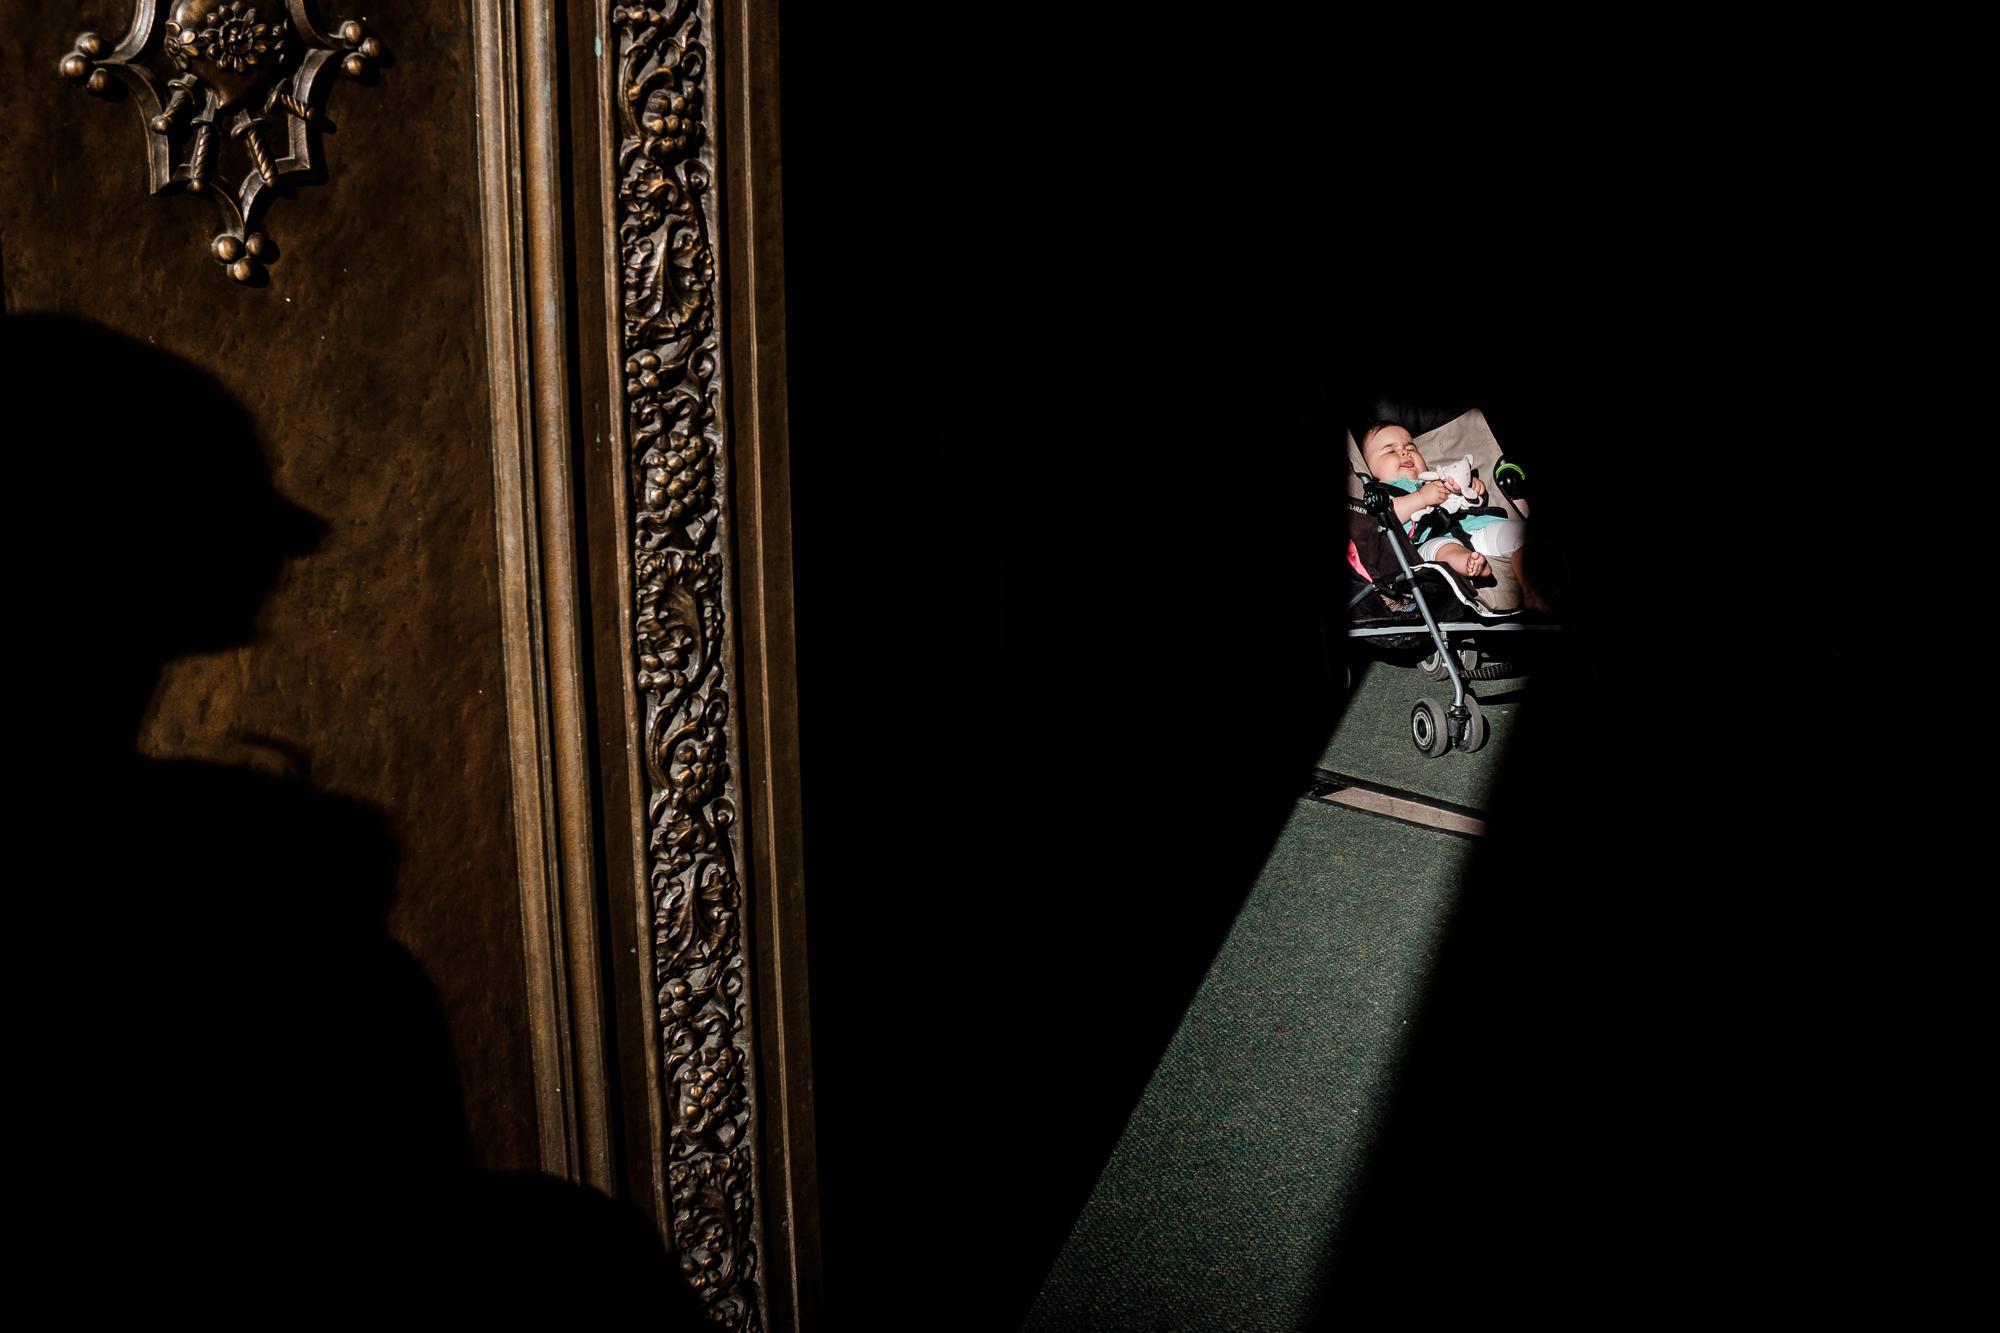 new-york-city-street-photographer-Youngjae-Lim-5